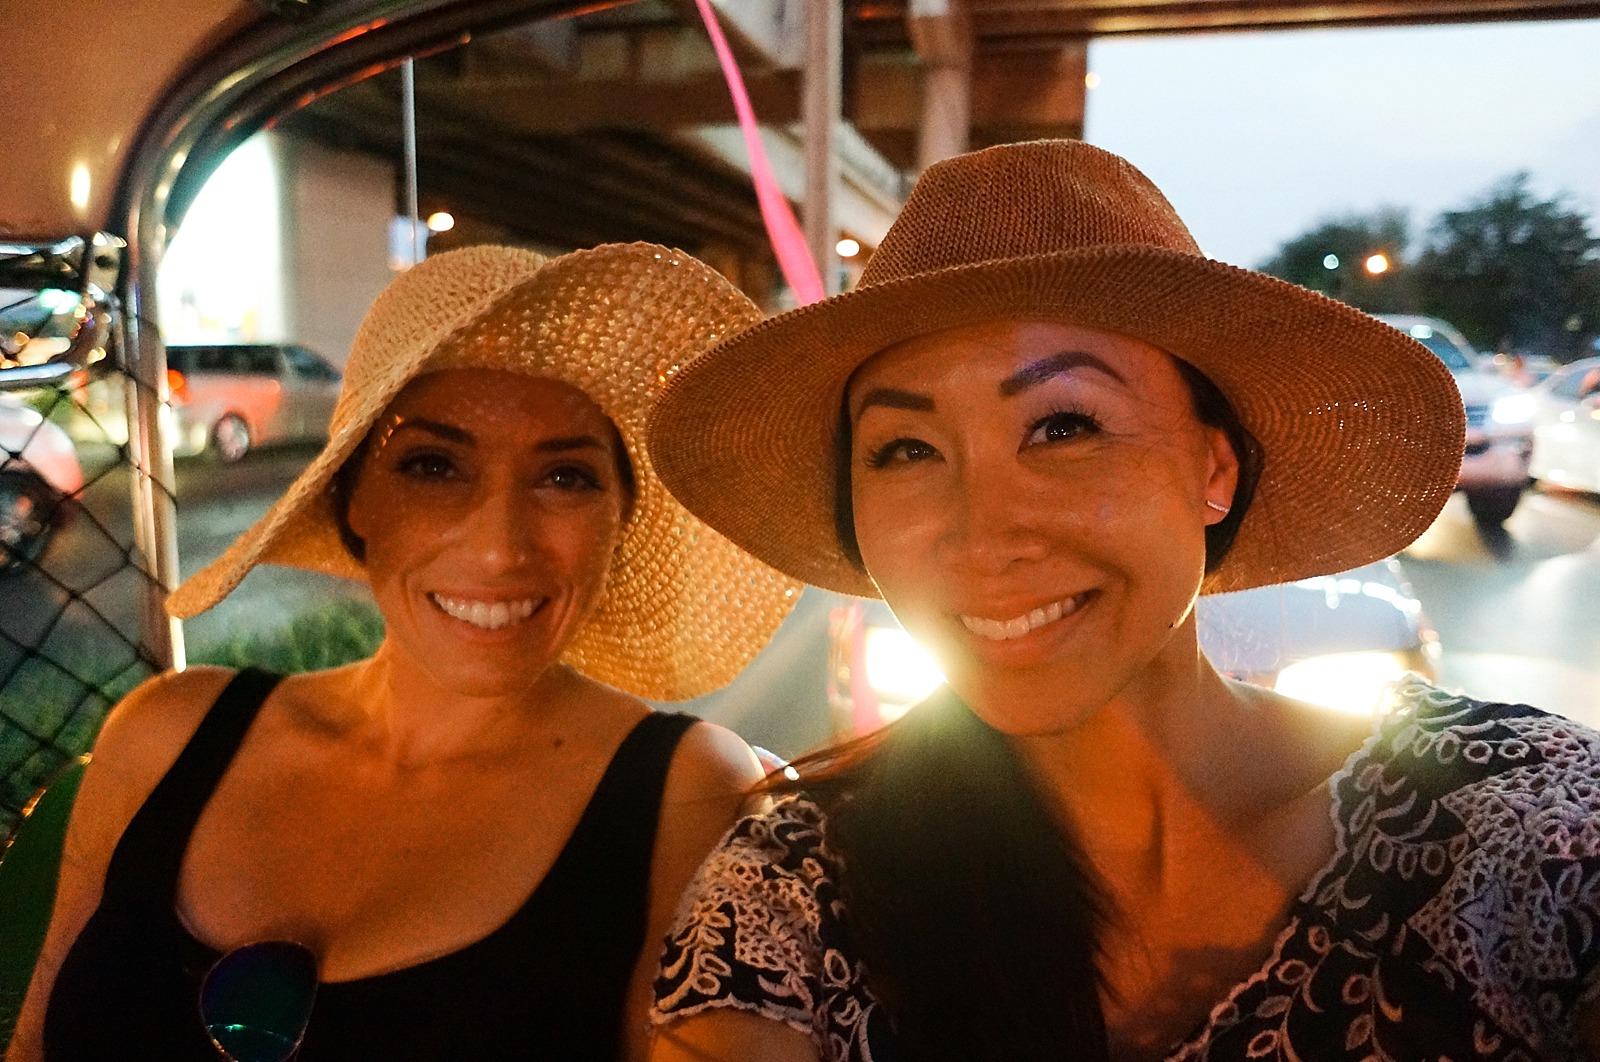 Thailand-diana-elizabeth-travel-blogger-phoenix-210